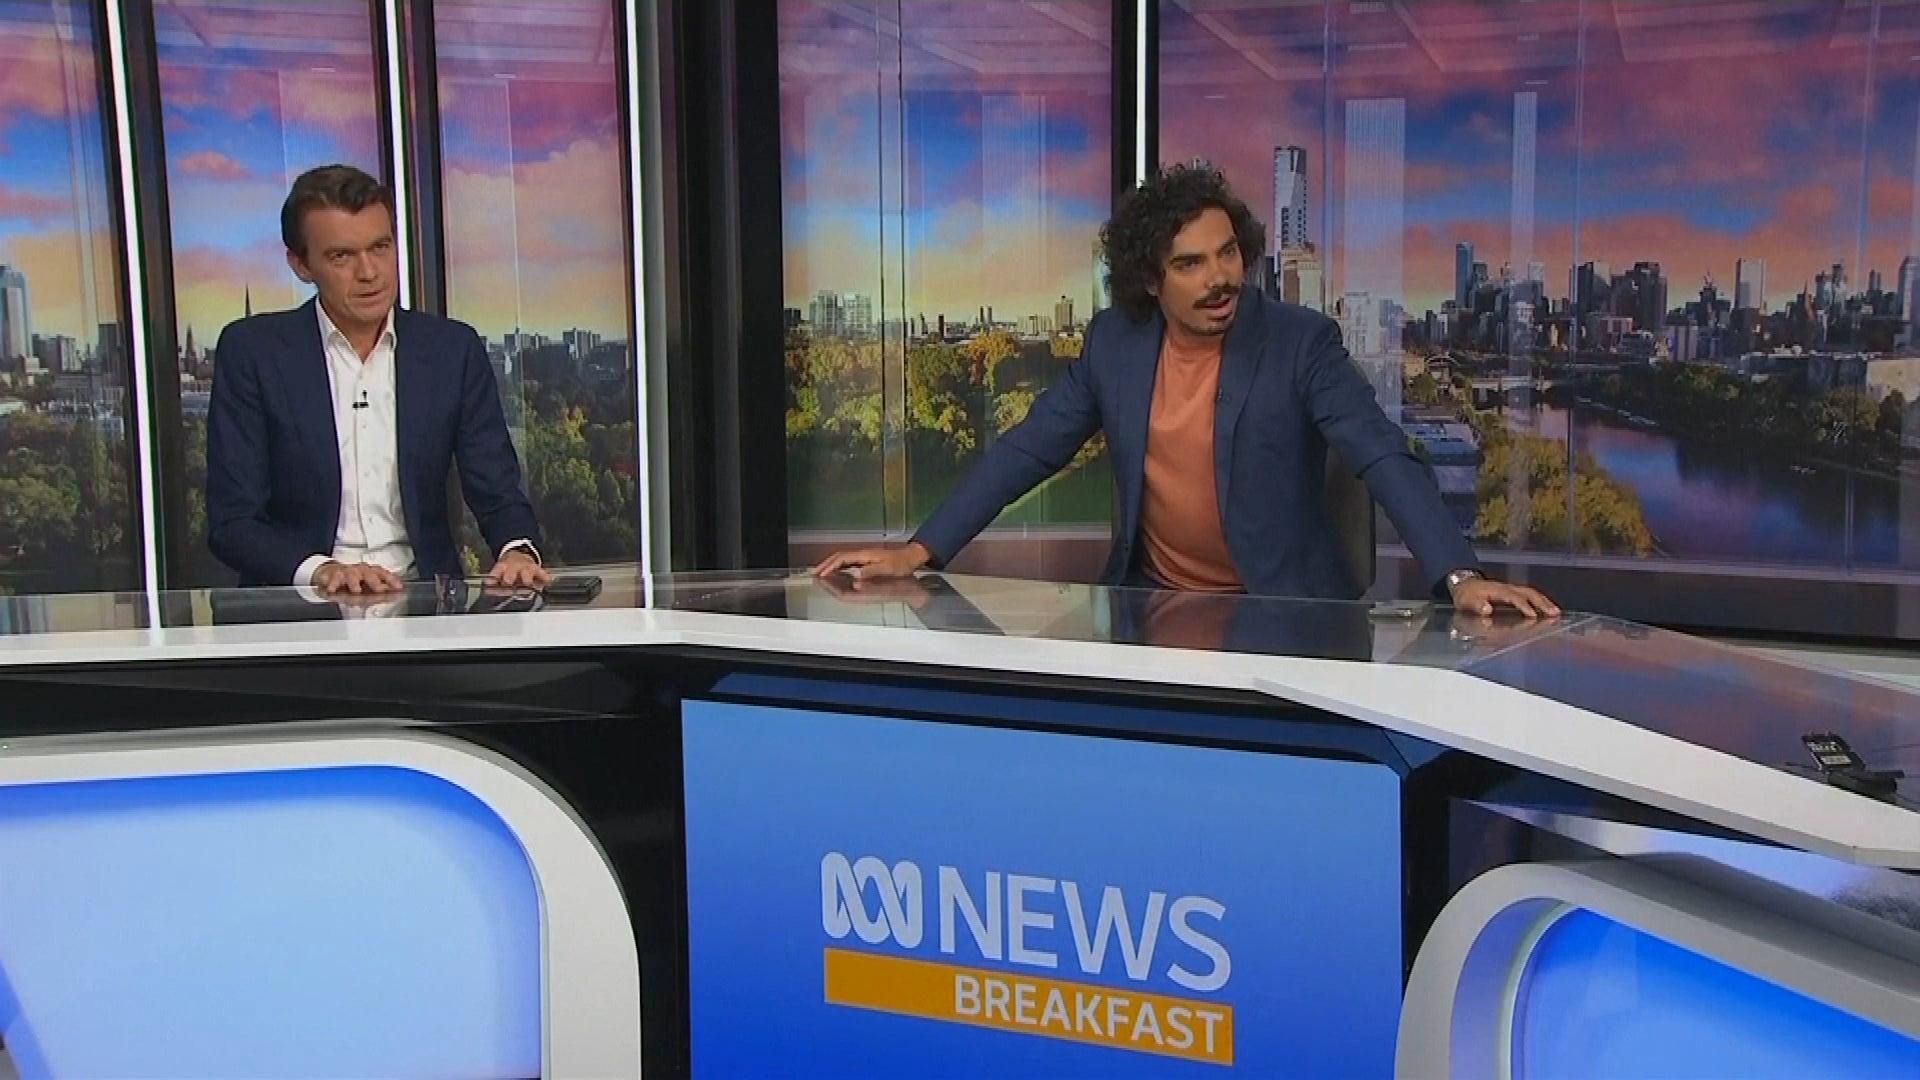 6.0 Magnitude Earthquake in Australia Surprises Everyone